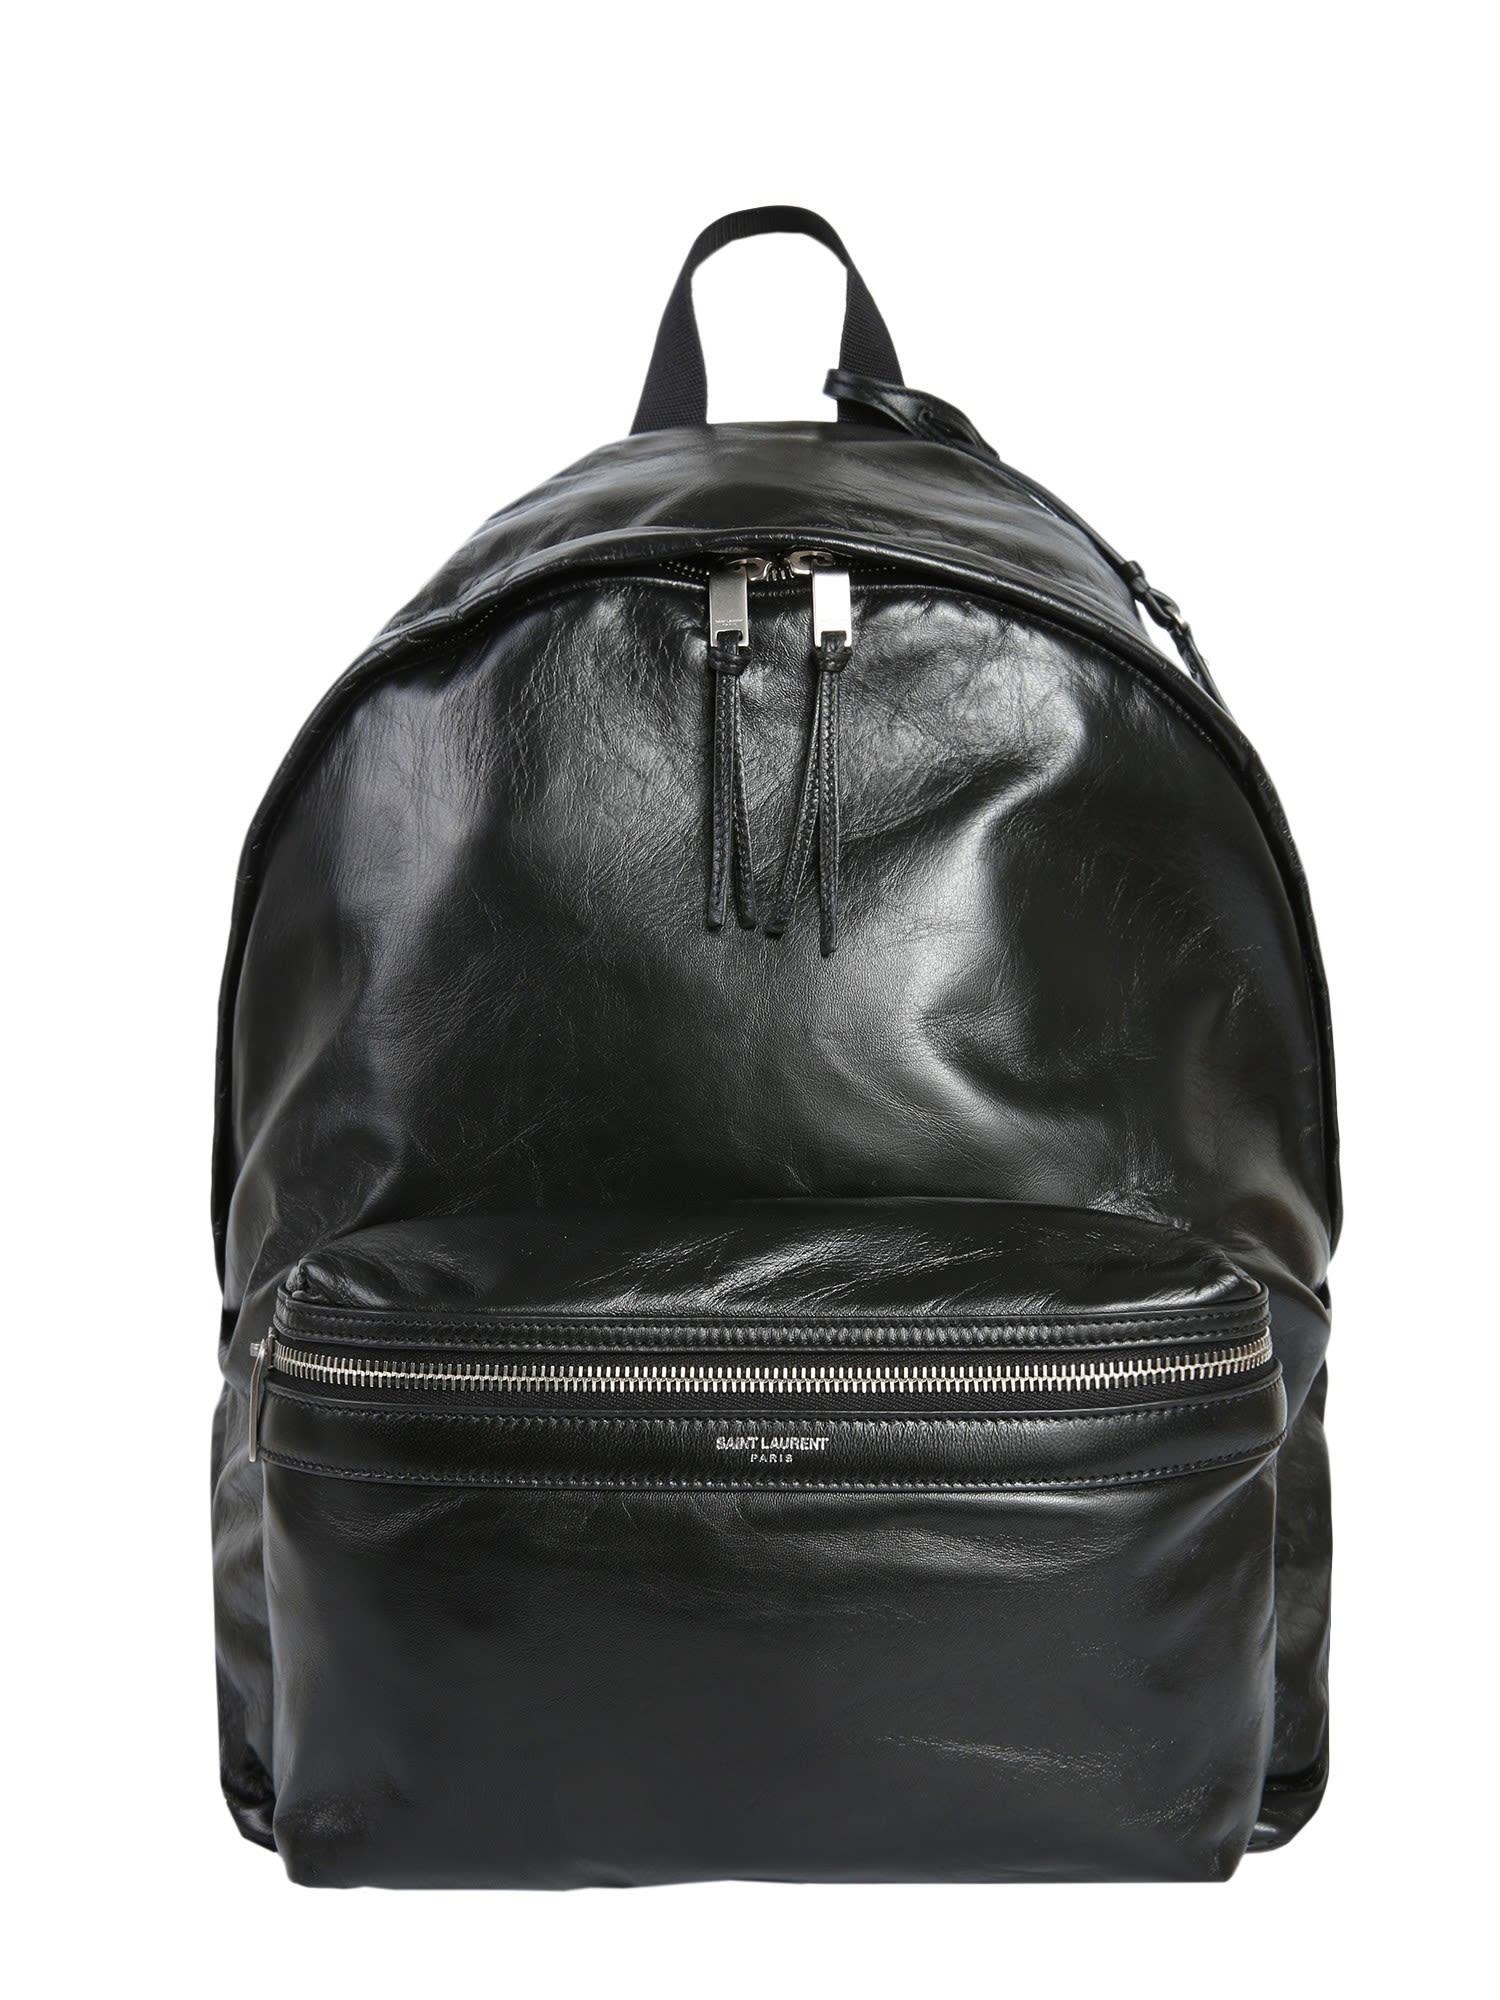 Foldable City Backpack